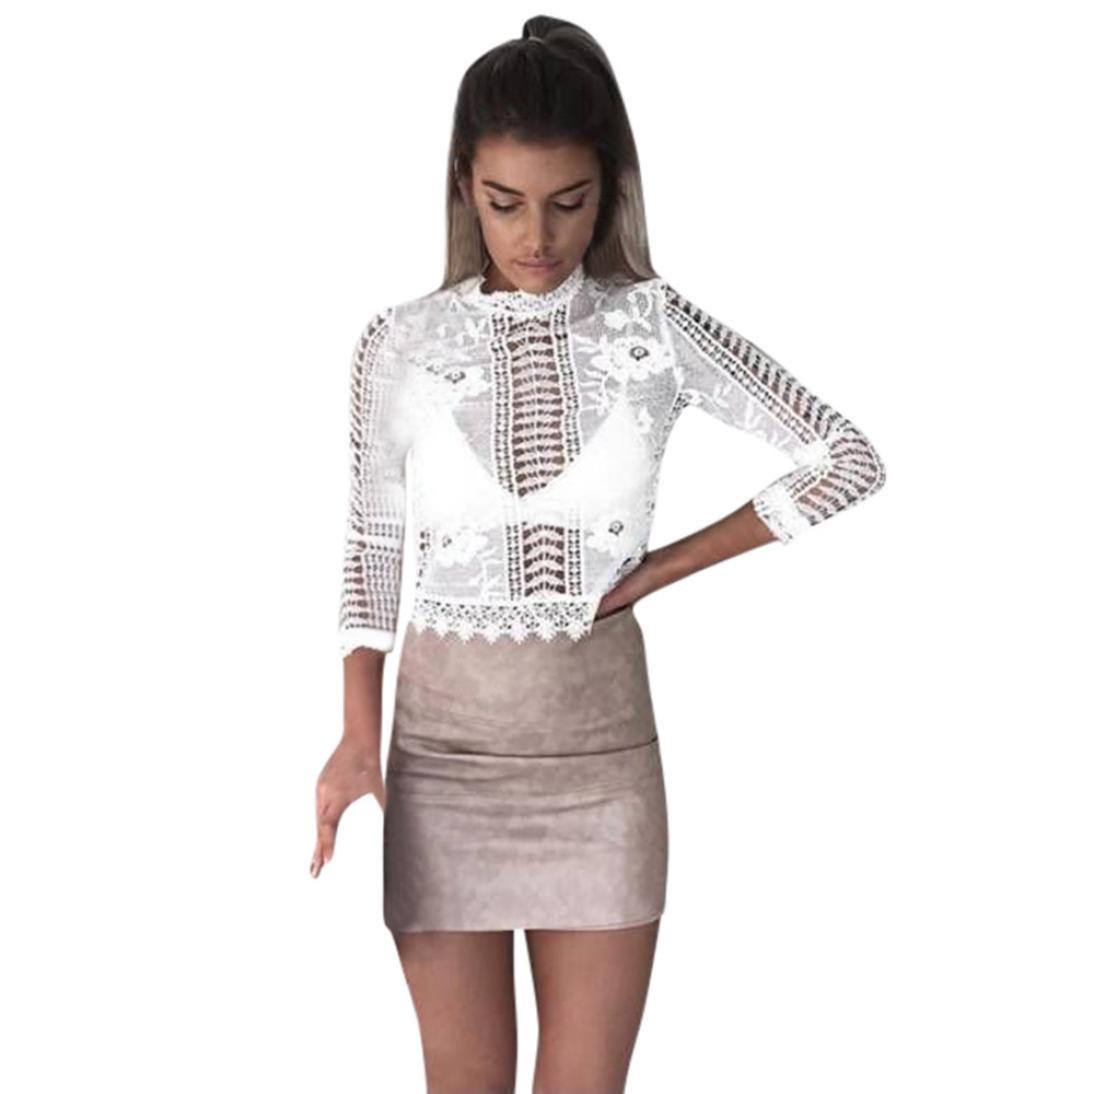 Camisate para mujer floral de encaje sexy de manga larga Camisa blusa femenina hueco sudadera Blouse Sweatshirt Pullover Dresses (Blanco, L): Amazon.es: ...